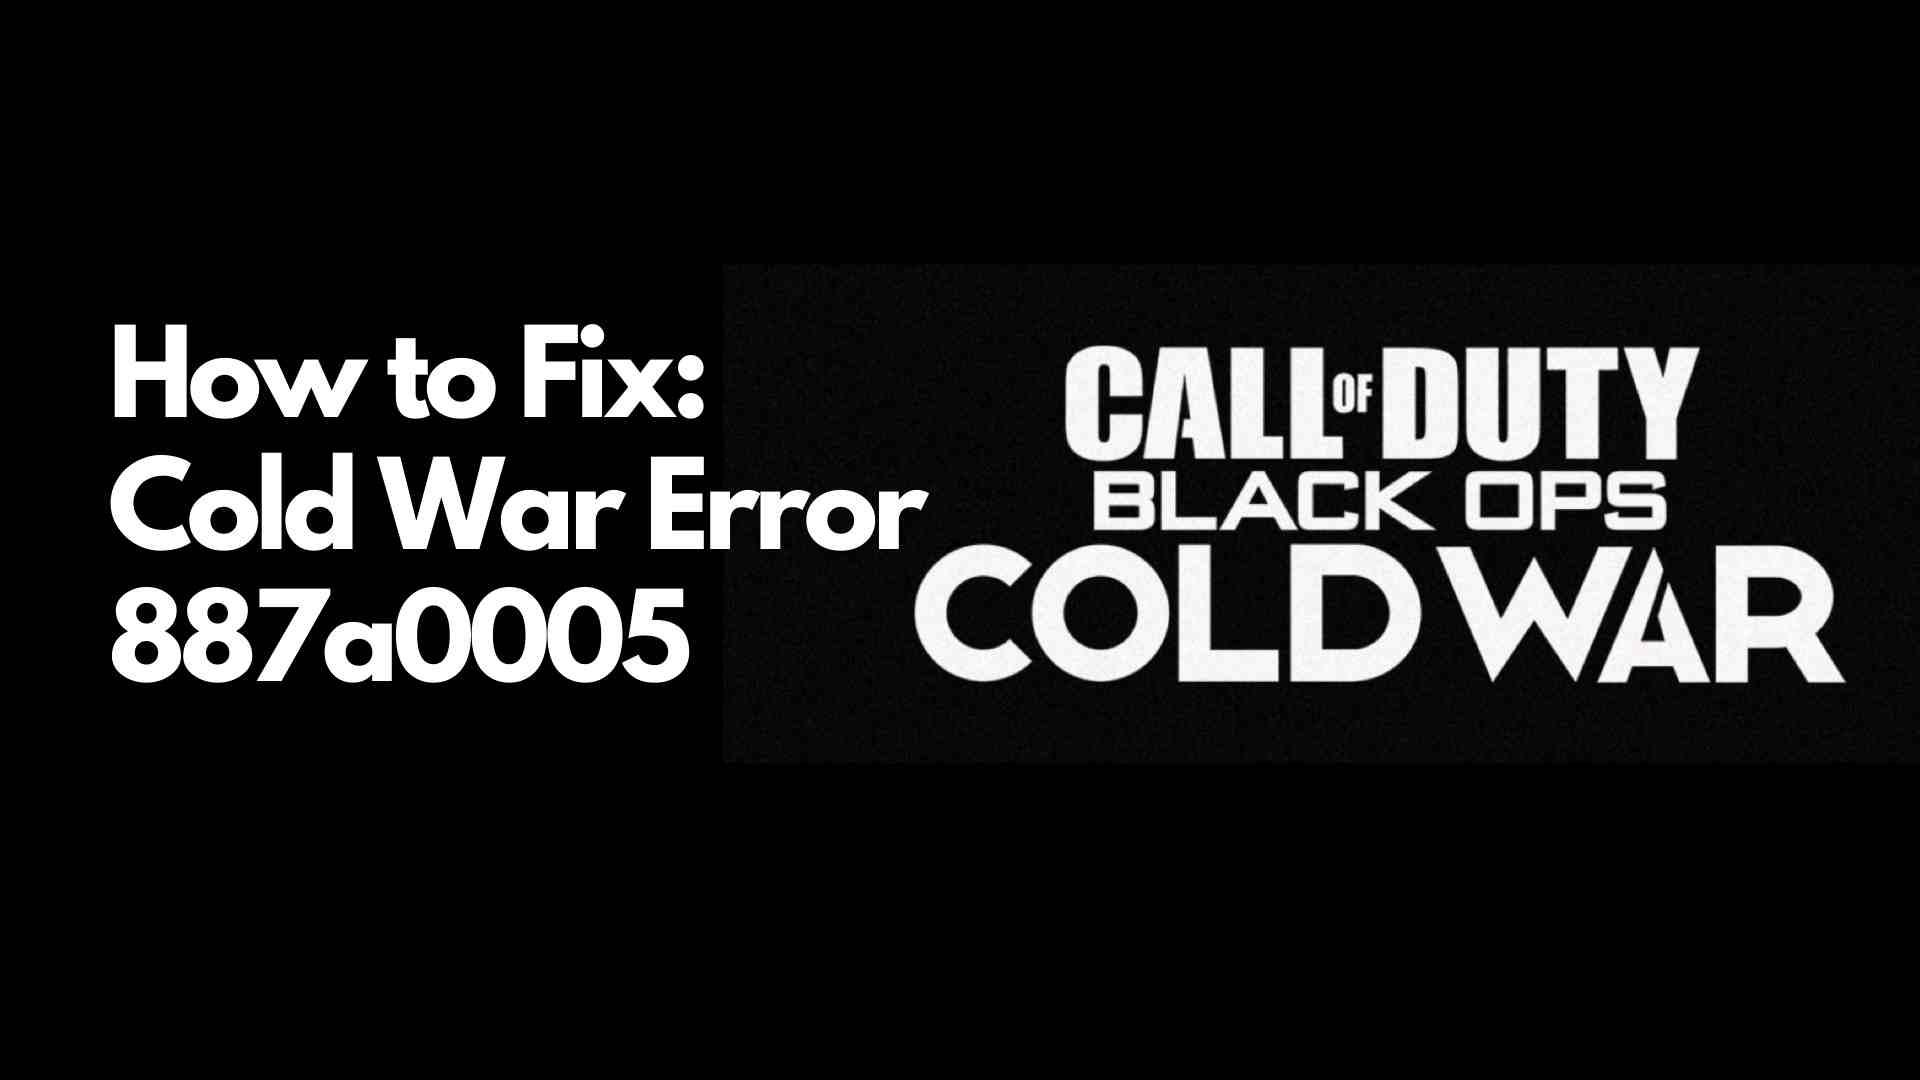 Cold War Error Code 887a0005 fix how to